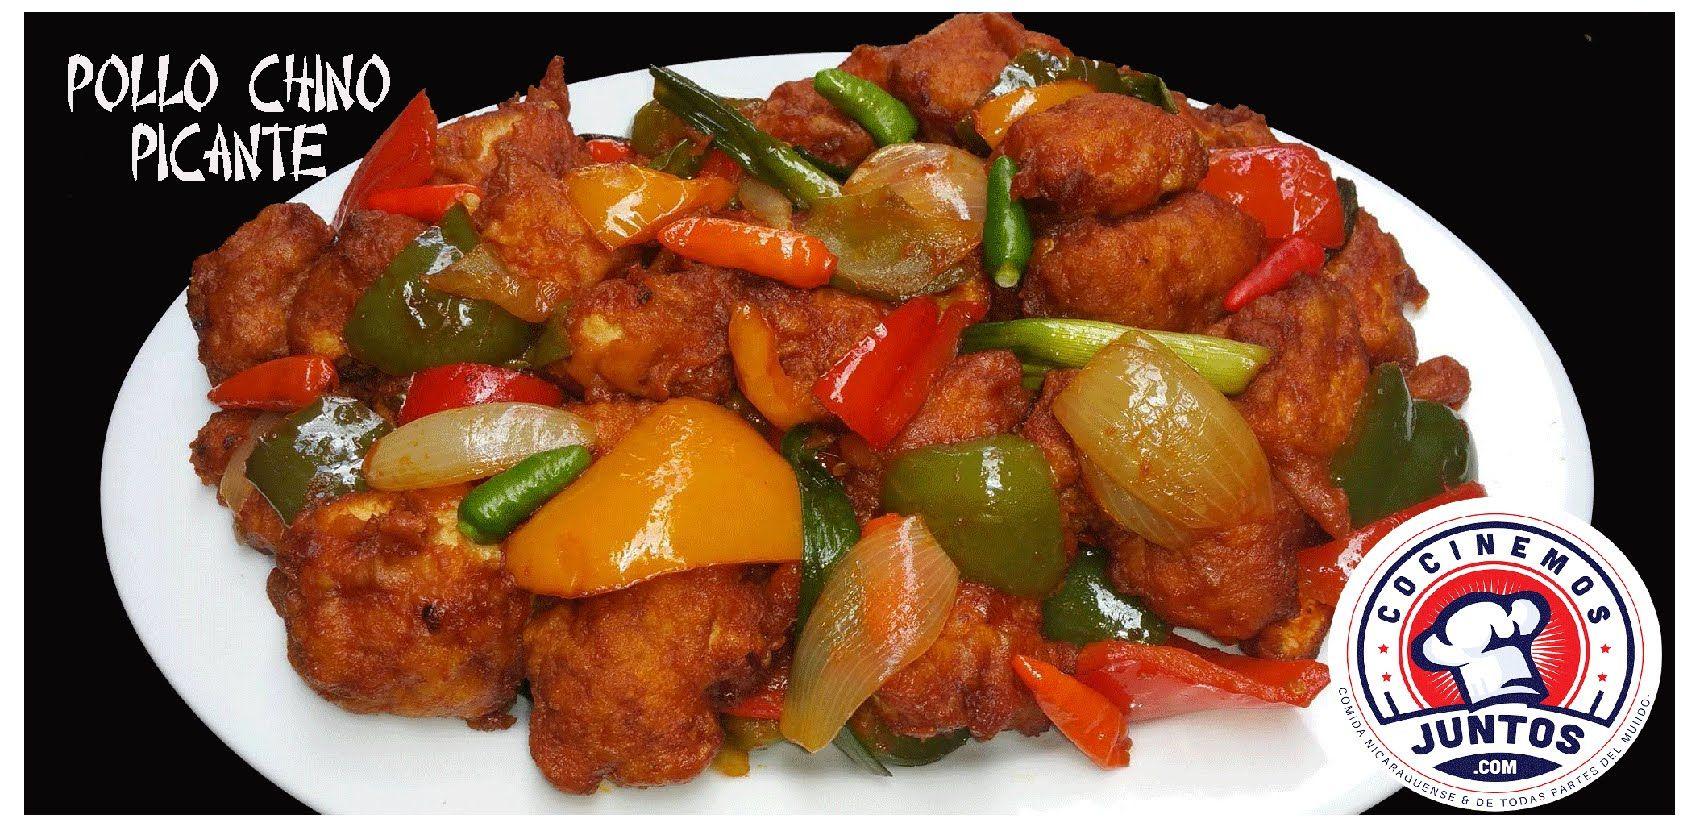 Pollo Chino Picante - Comida China | Chinese food / Comida china ...